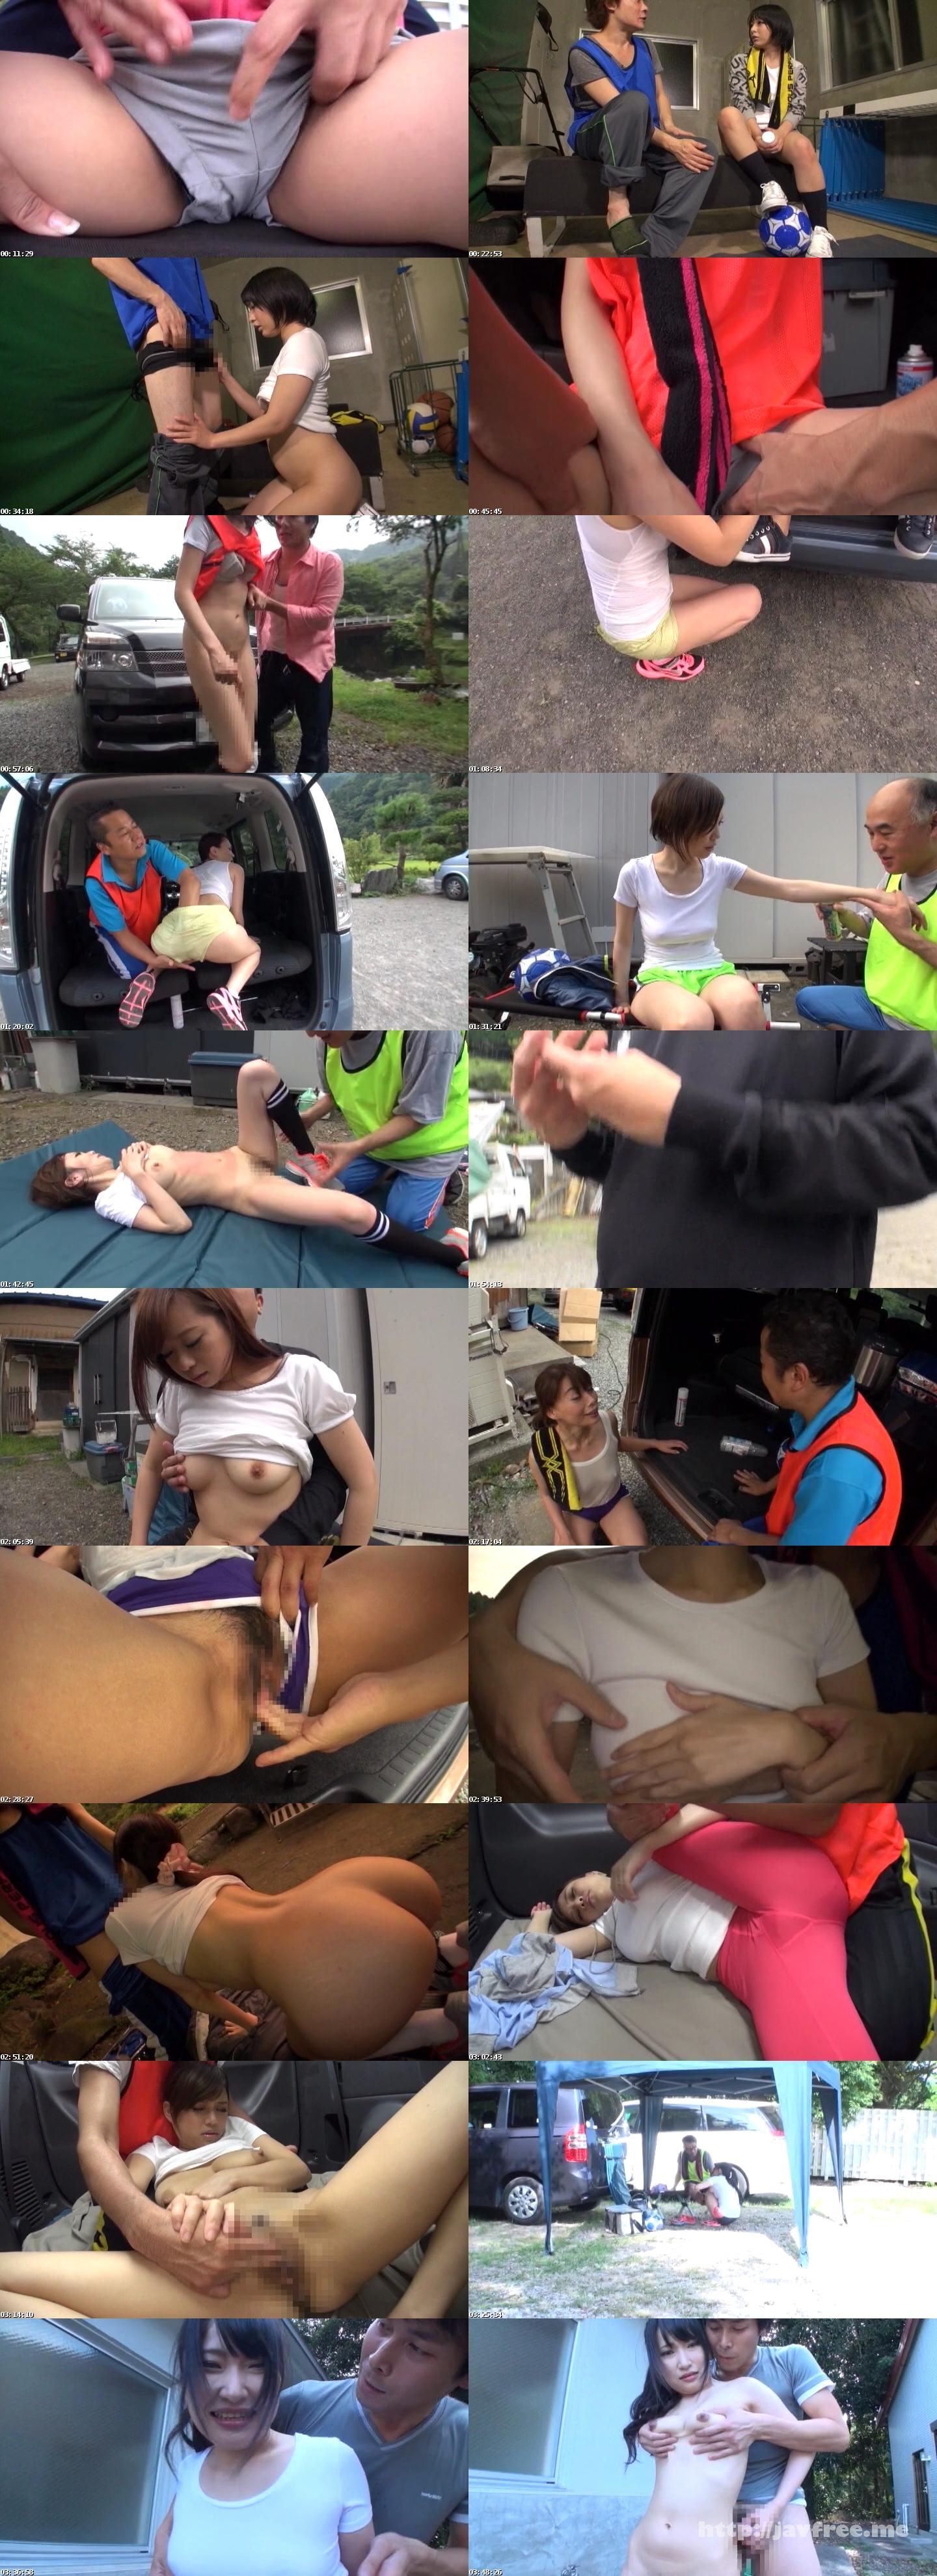 [ONGP 004] フットサルチームにいる人妻はエロカワ率高し!練習の合間にナンパして即ハメ中出し! ONGP